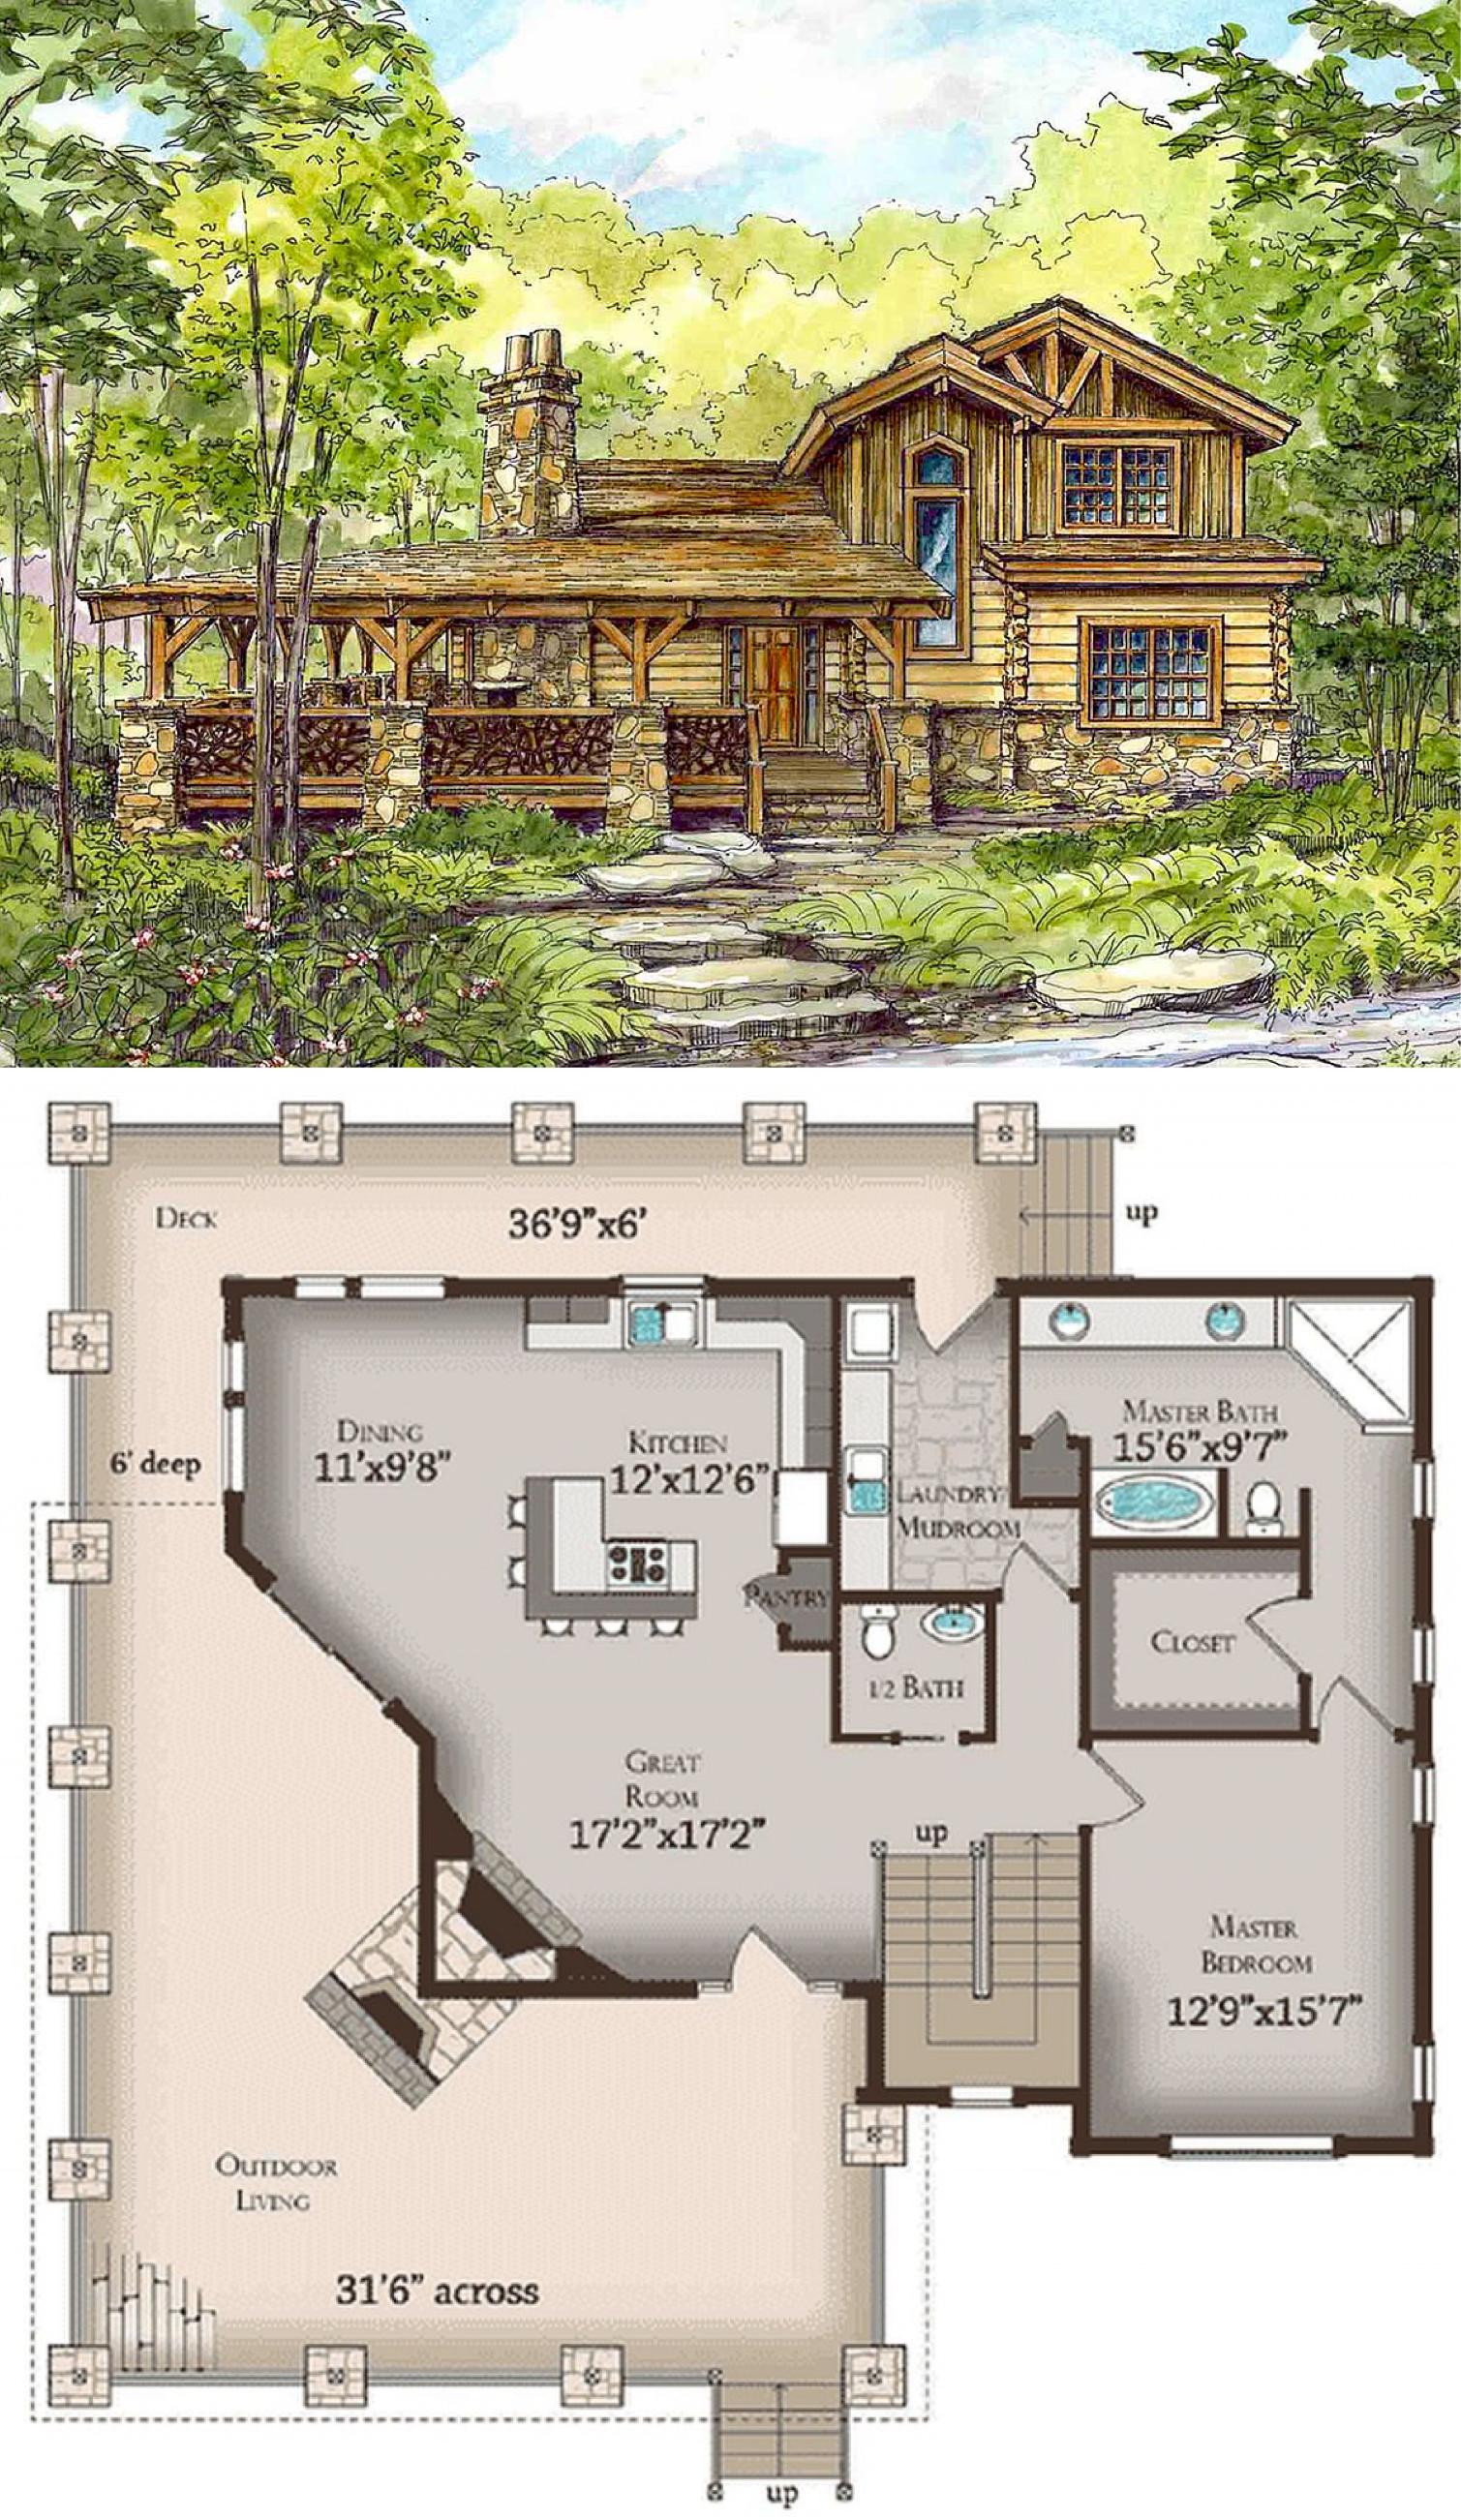 Huge Wrap Around Porch Plan 13318ww Porch Plans House Plans Wrap Around Porch